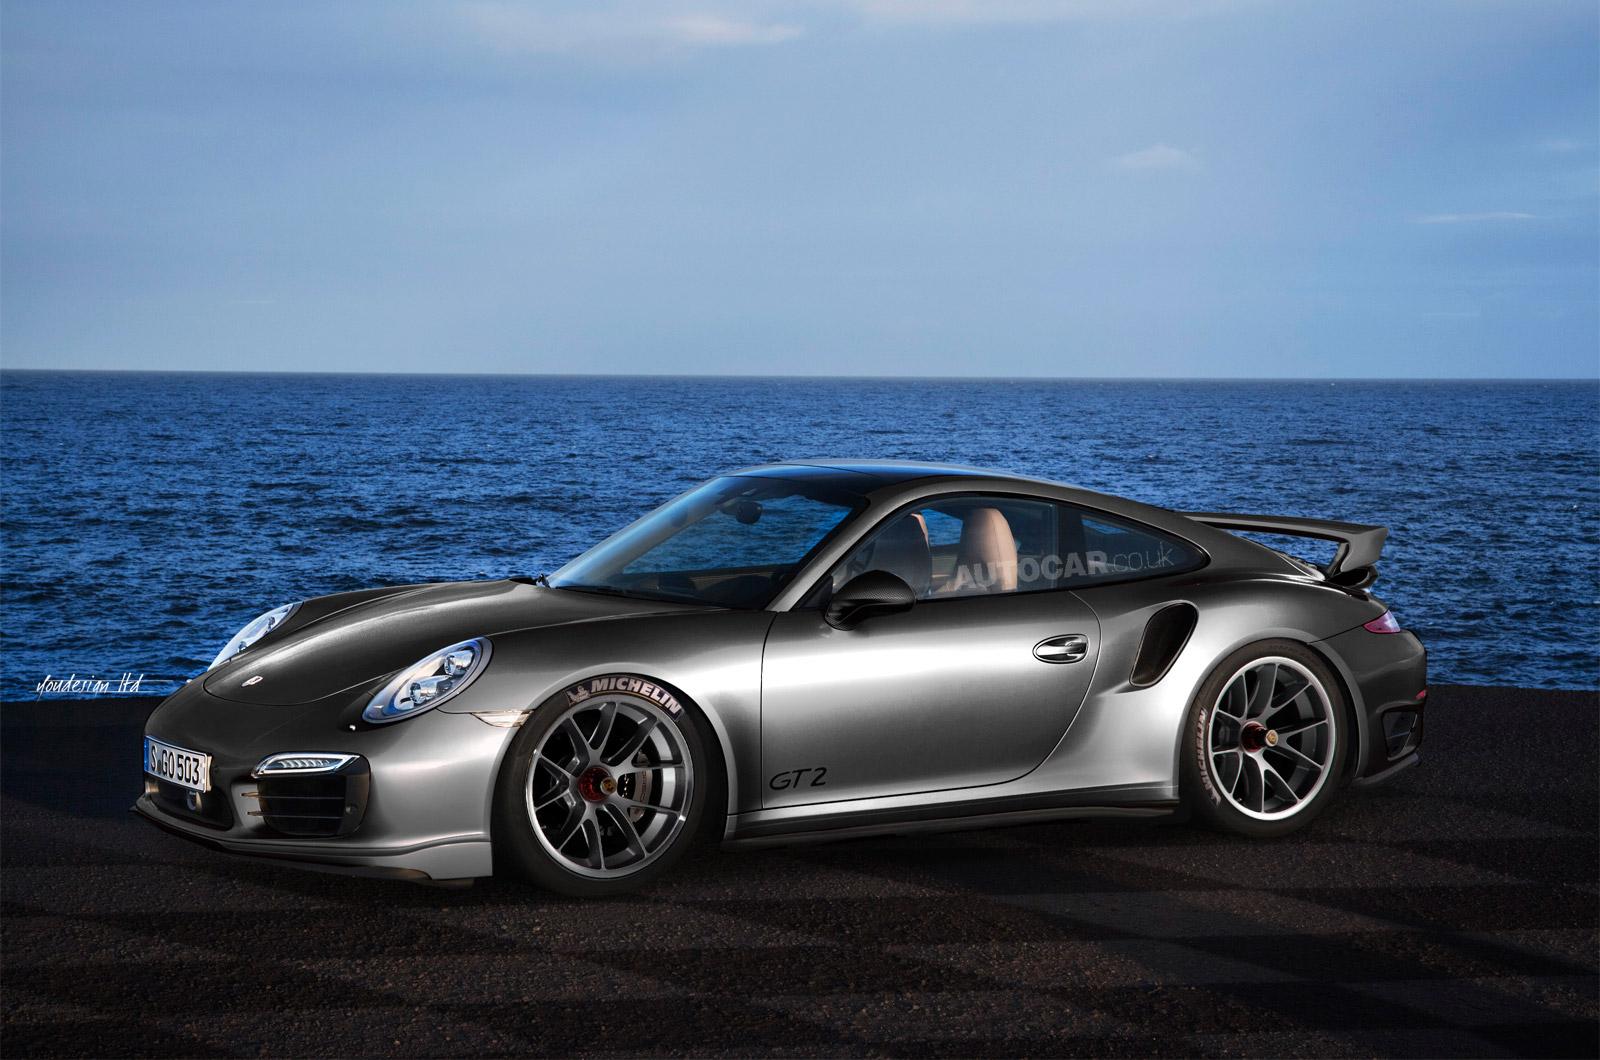 2014 porsche 911 turbo s release date specs price pictures